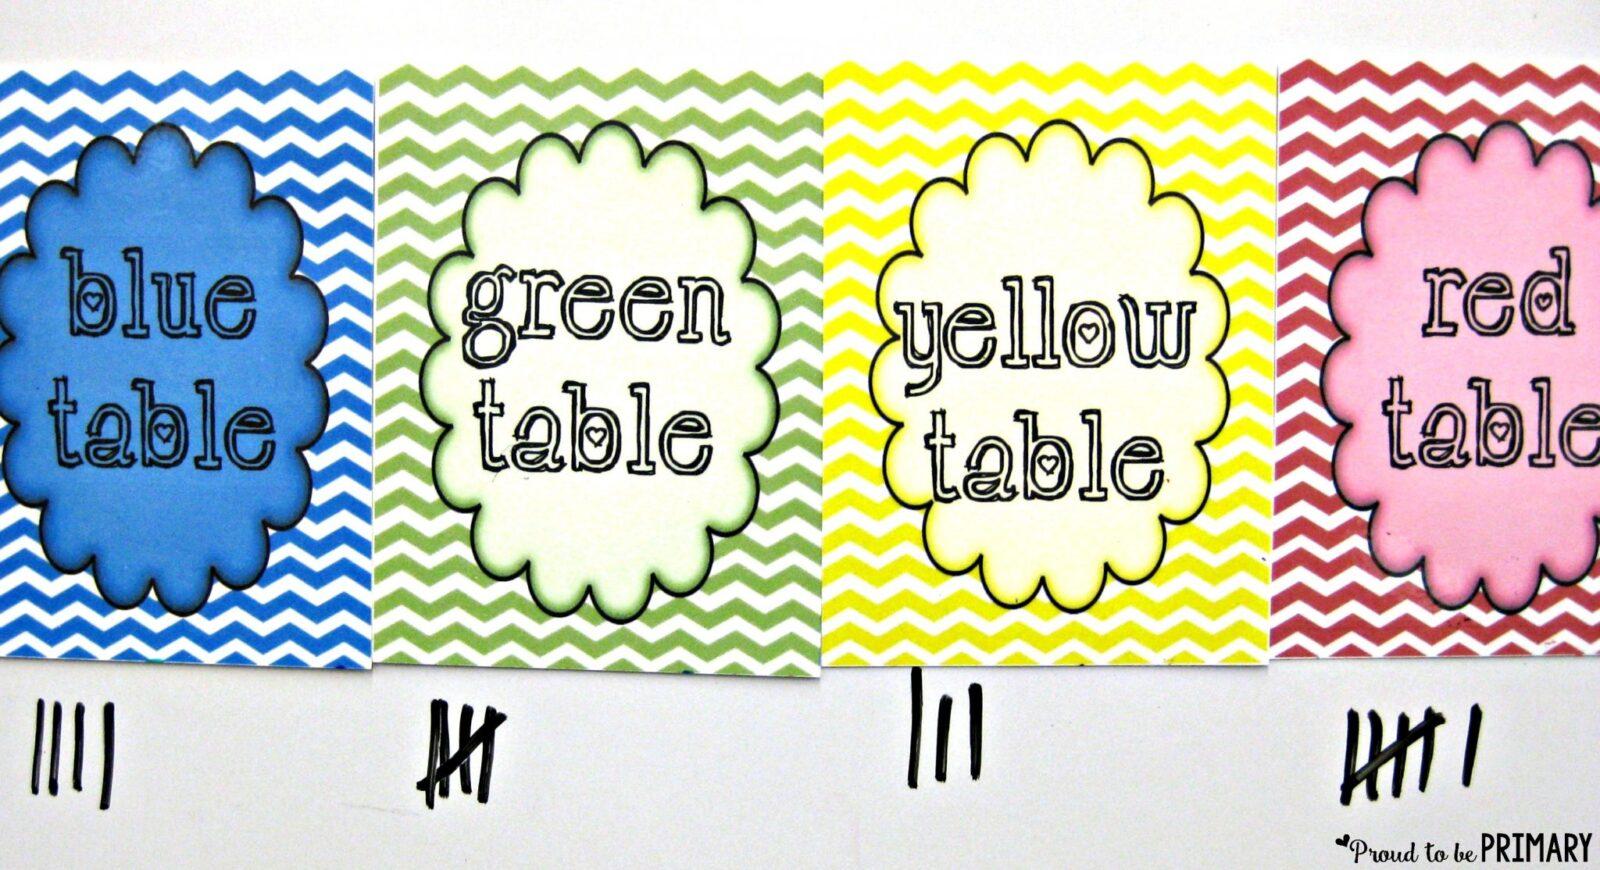 new teachers table set up